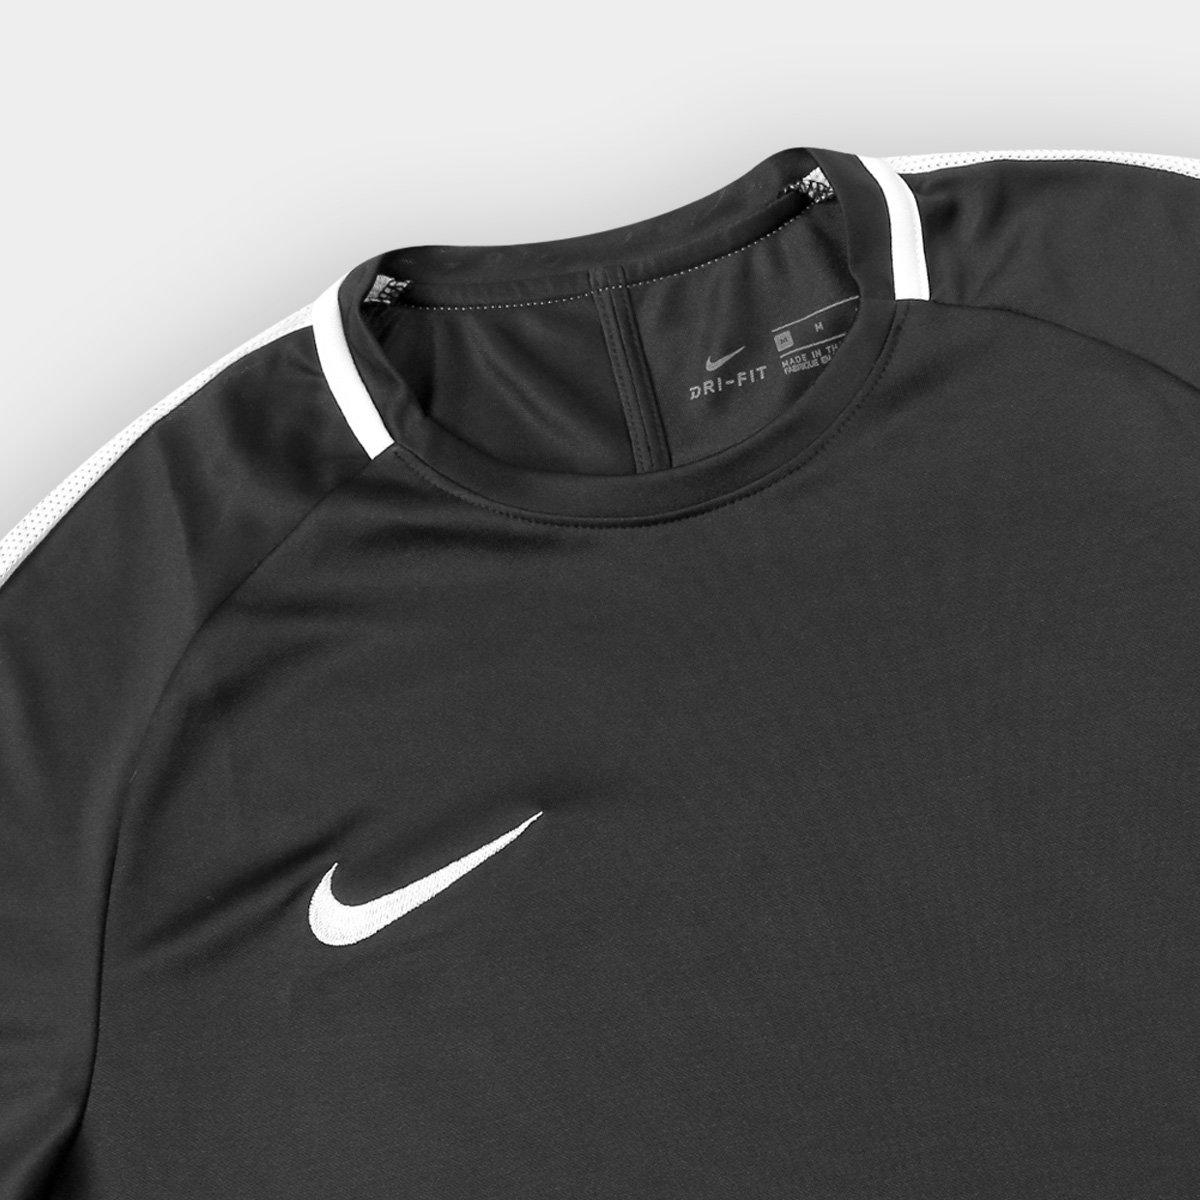 Camisa Nike Academy Masculina - Preto e Branco - Compre Agora  21b1f8855bafc